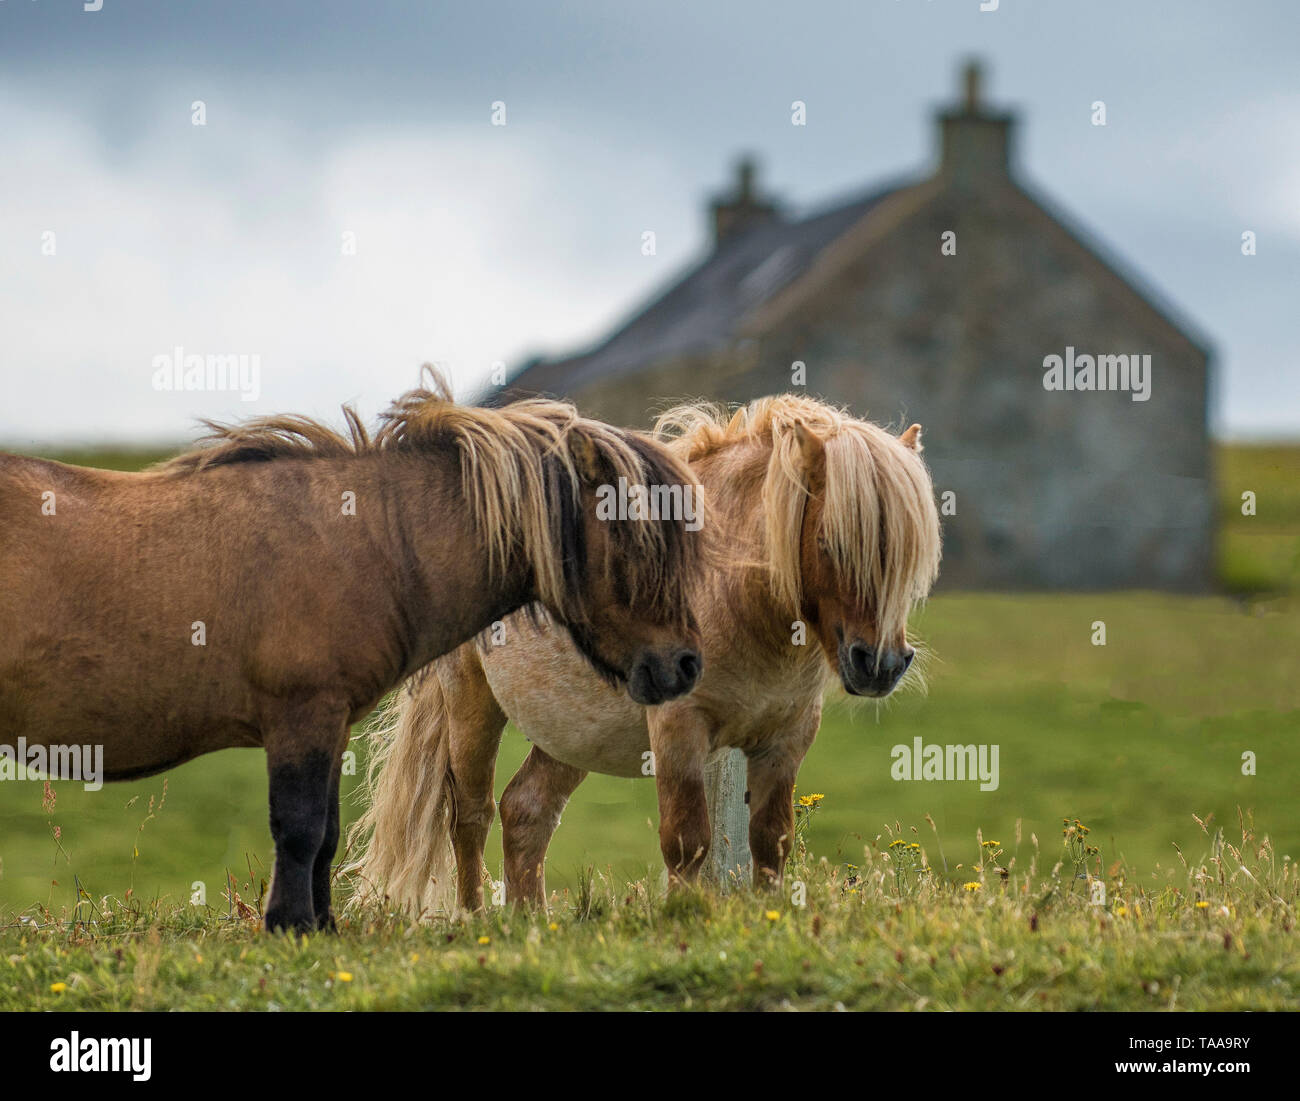 Two shetland ponies and cottage, Shetland - Stock Image